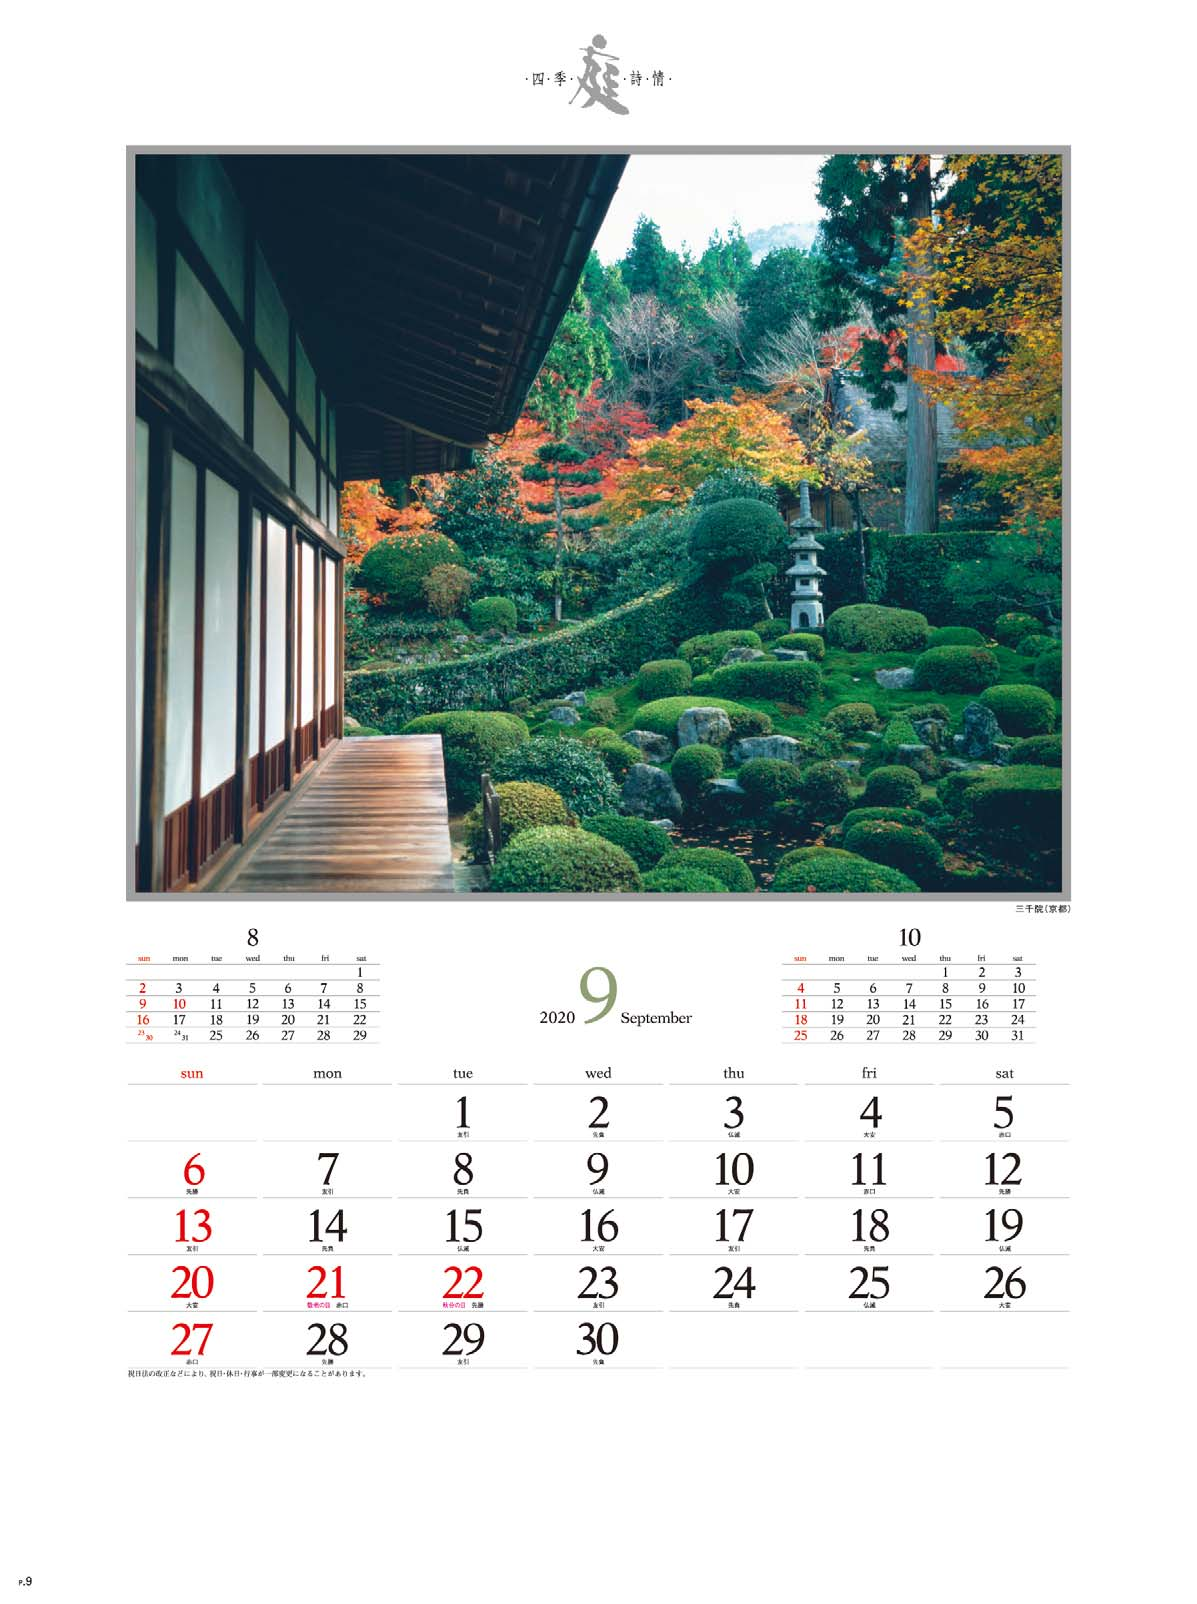 画像:三千院(京都) 庭・四季詩情 2020年カレンダー